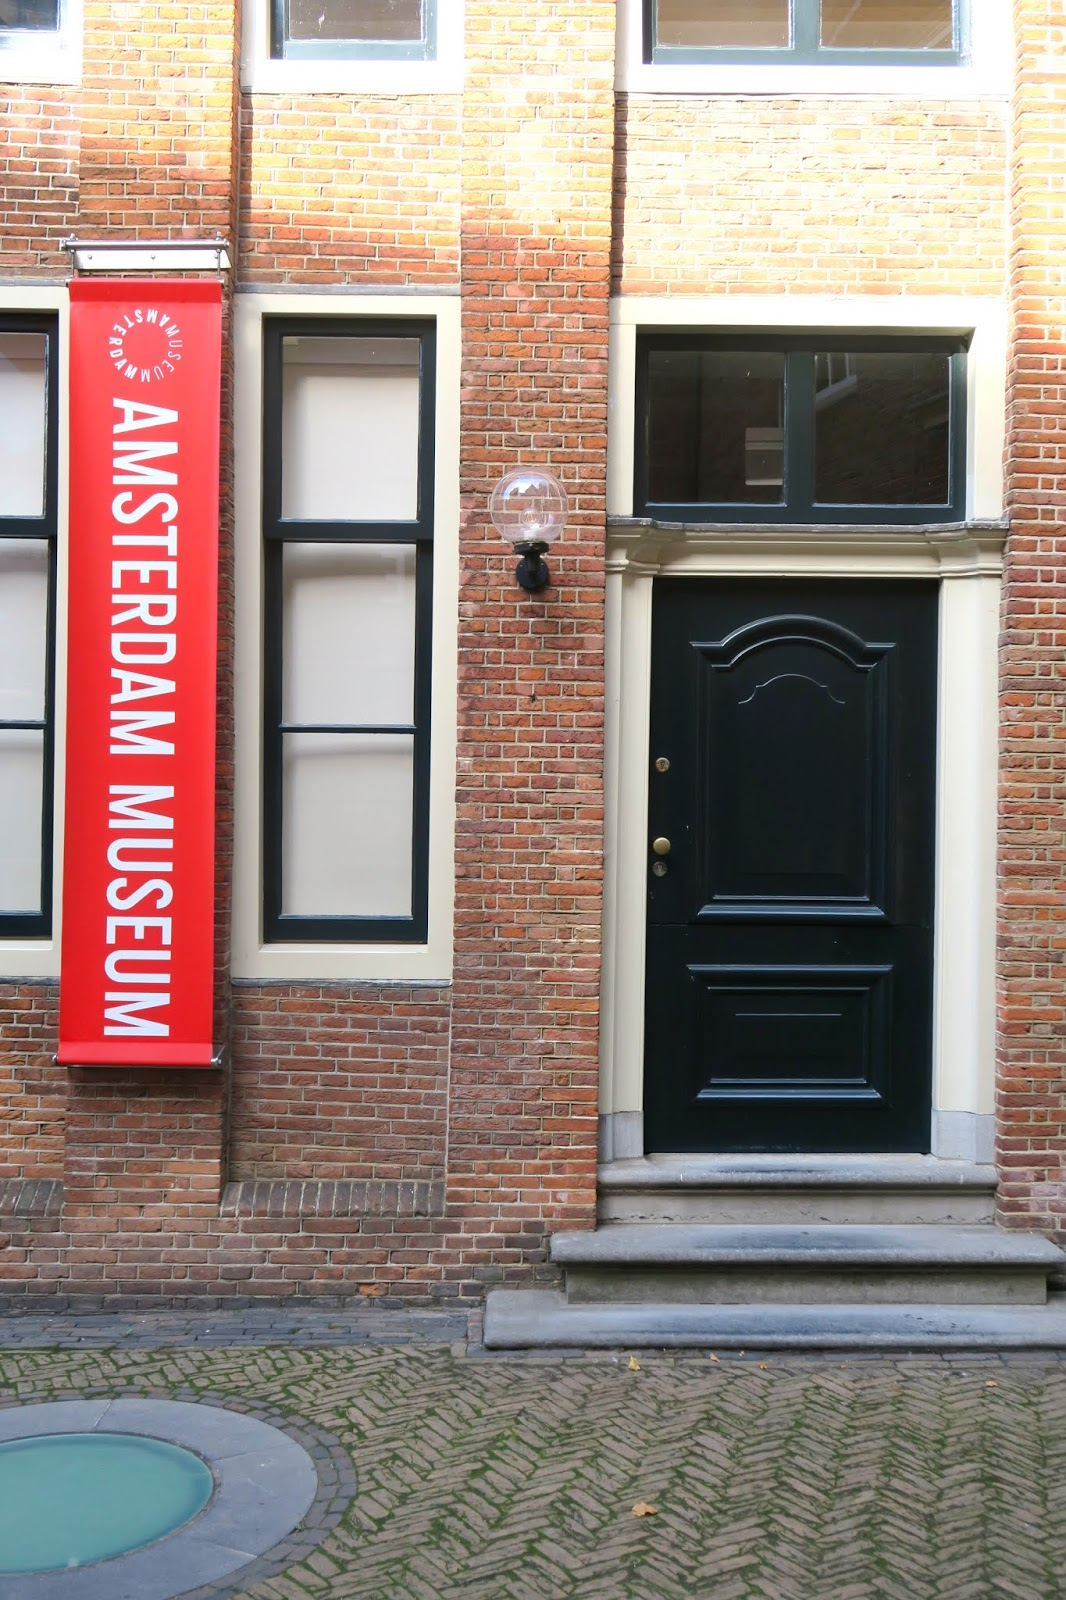 Amsterdam Museum Outdoor Exterior